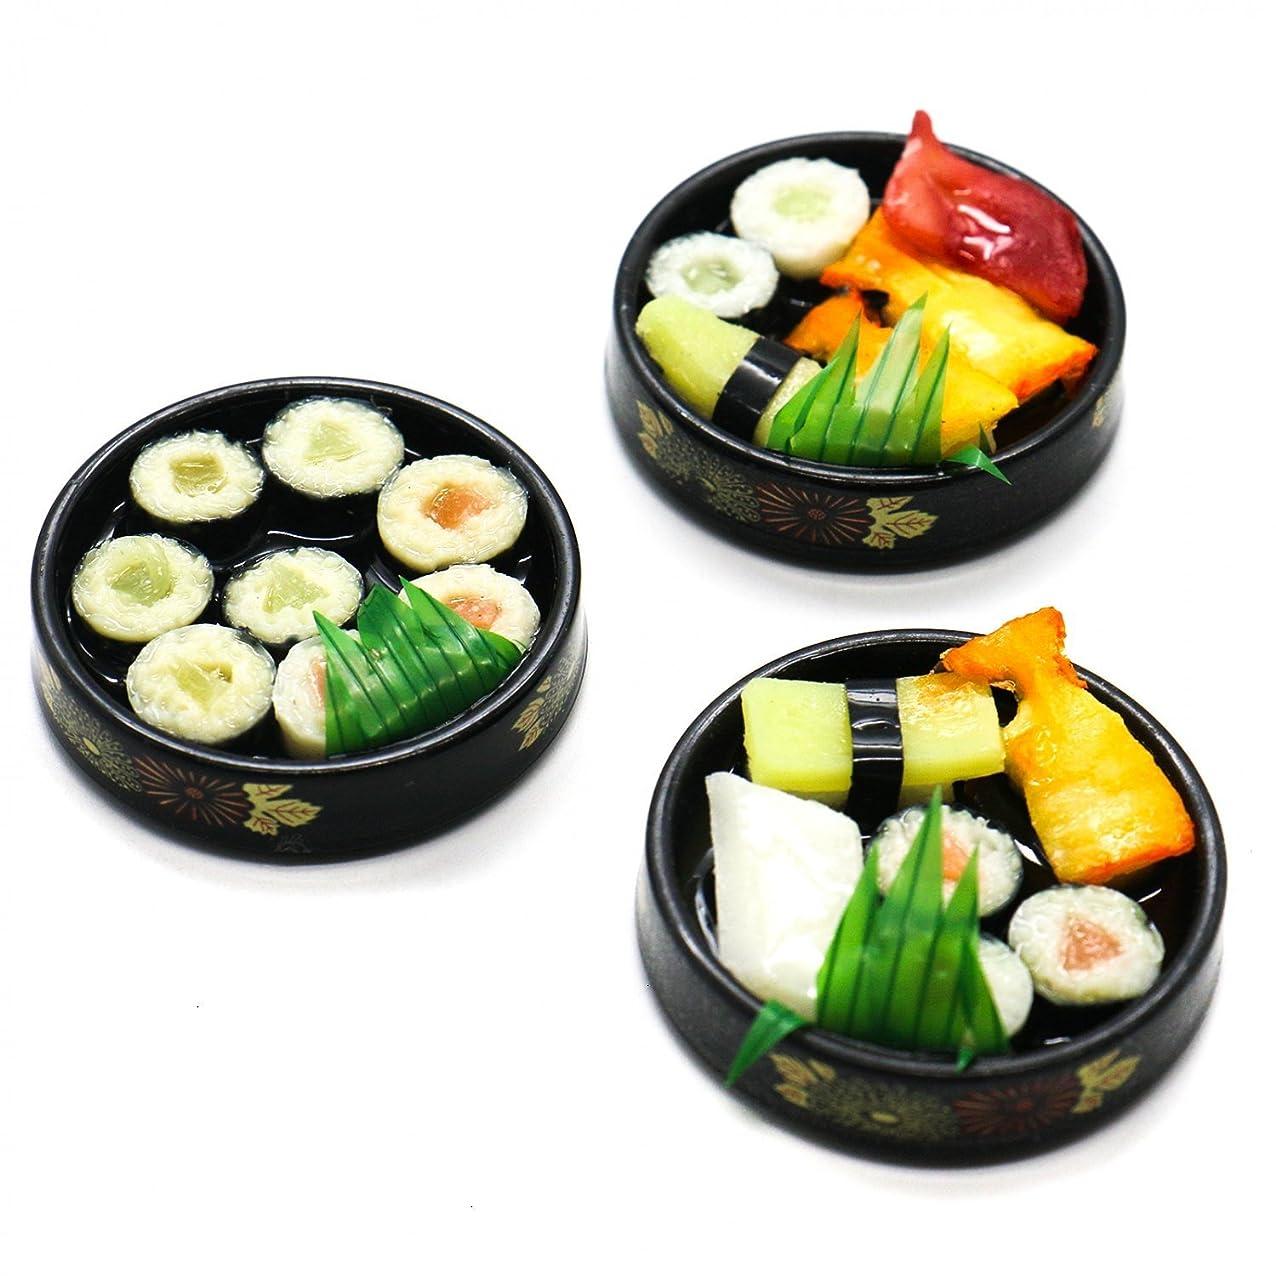 HUELE 3 pcs Realistic Handicraft Sushi Bento Set Dollhouse Miniature Japanese Food Decoration Tableware Play Food Set for Kids acvemfehuraly716